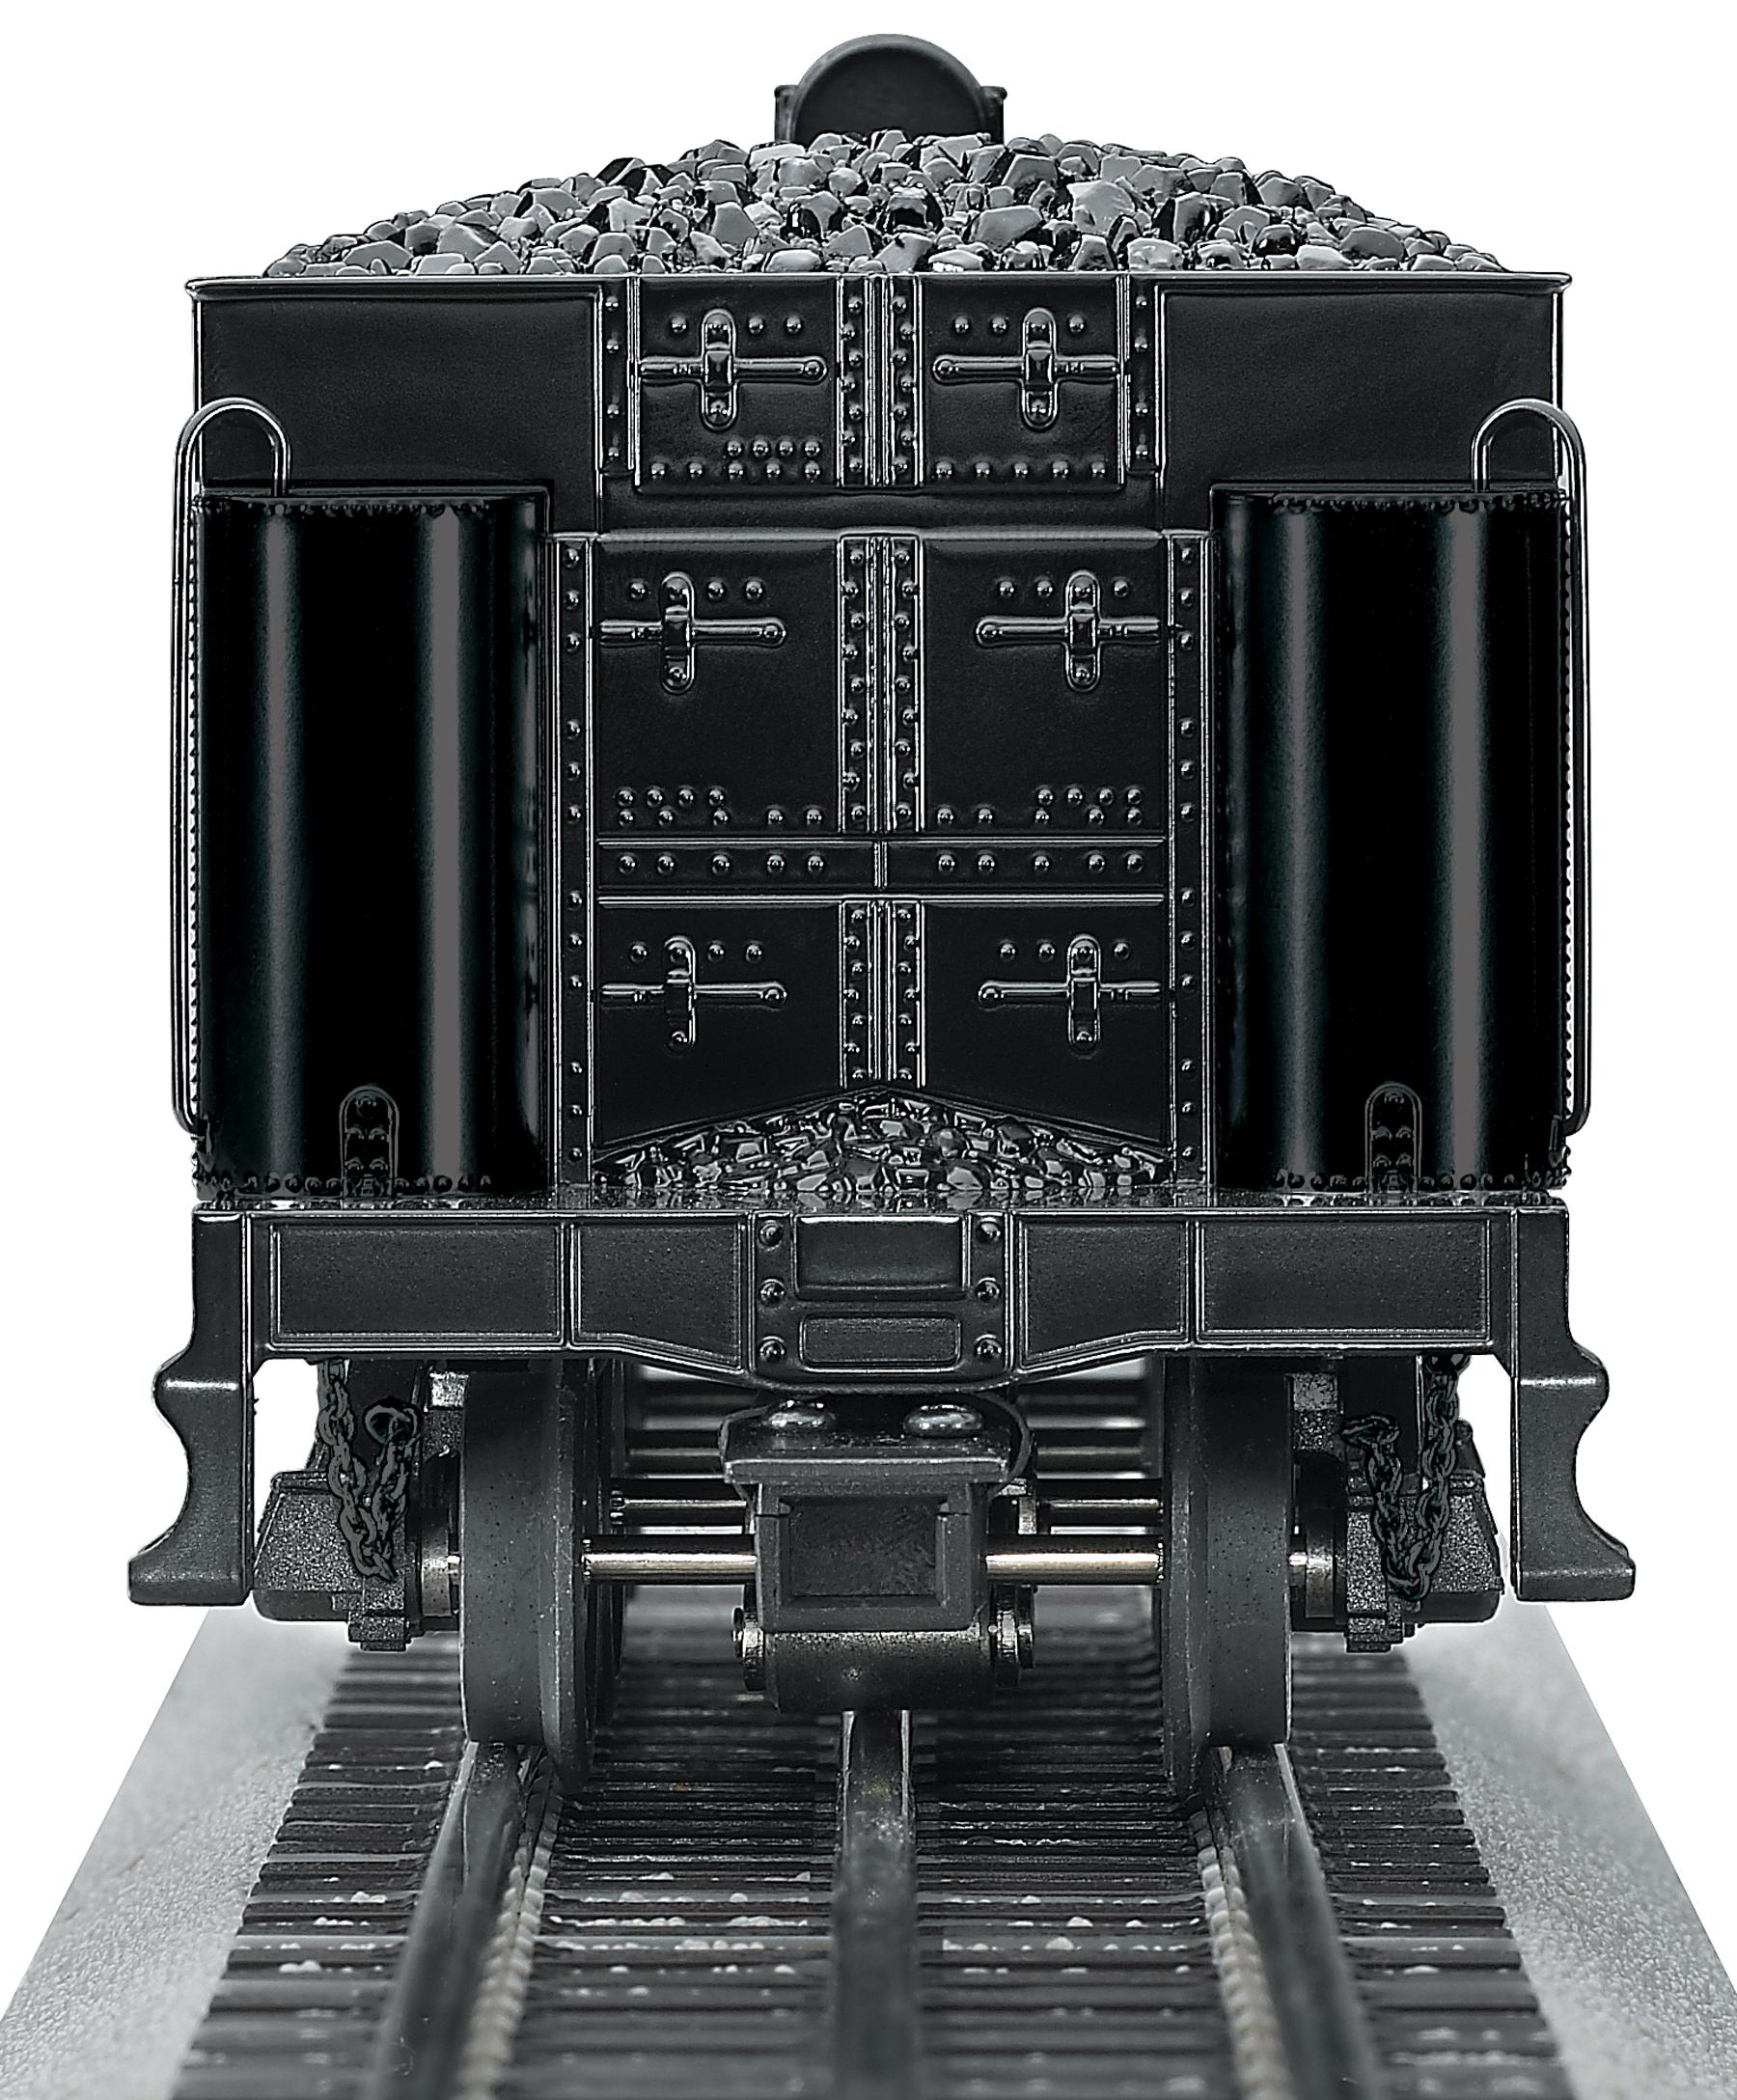 hight resolution of wabash tmcc scale 2 6 0 mogul steam locomotive 826 rh lionel com lionel locomotive parts diagram lionel motor wiring diagram